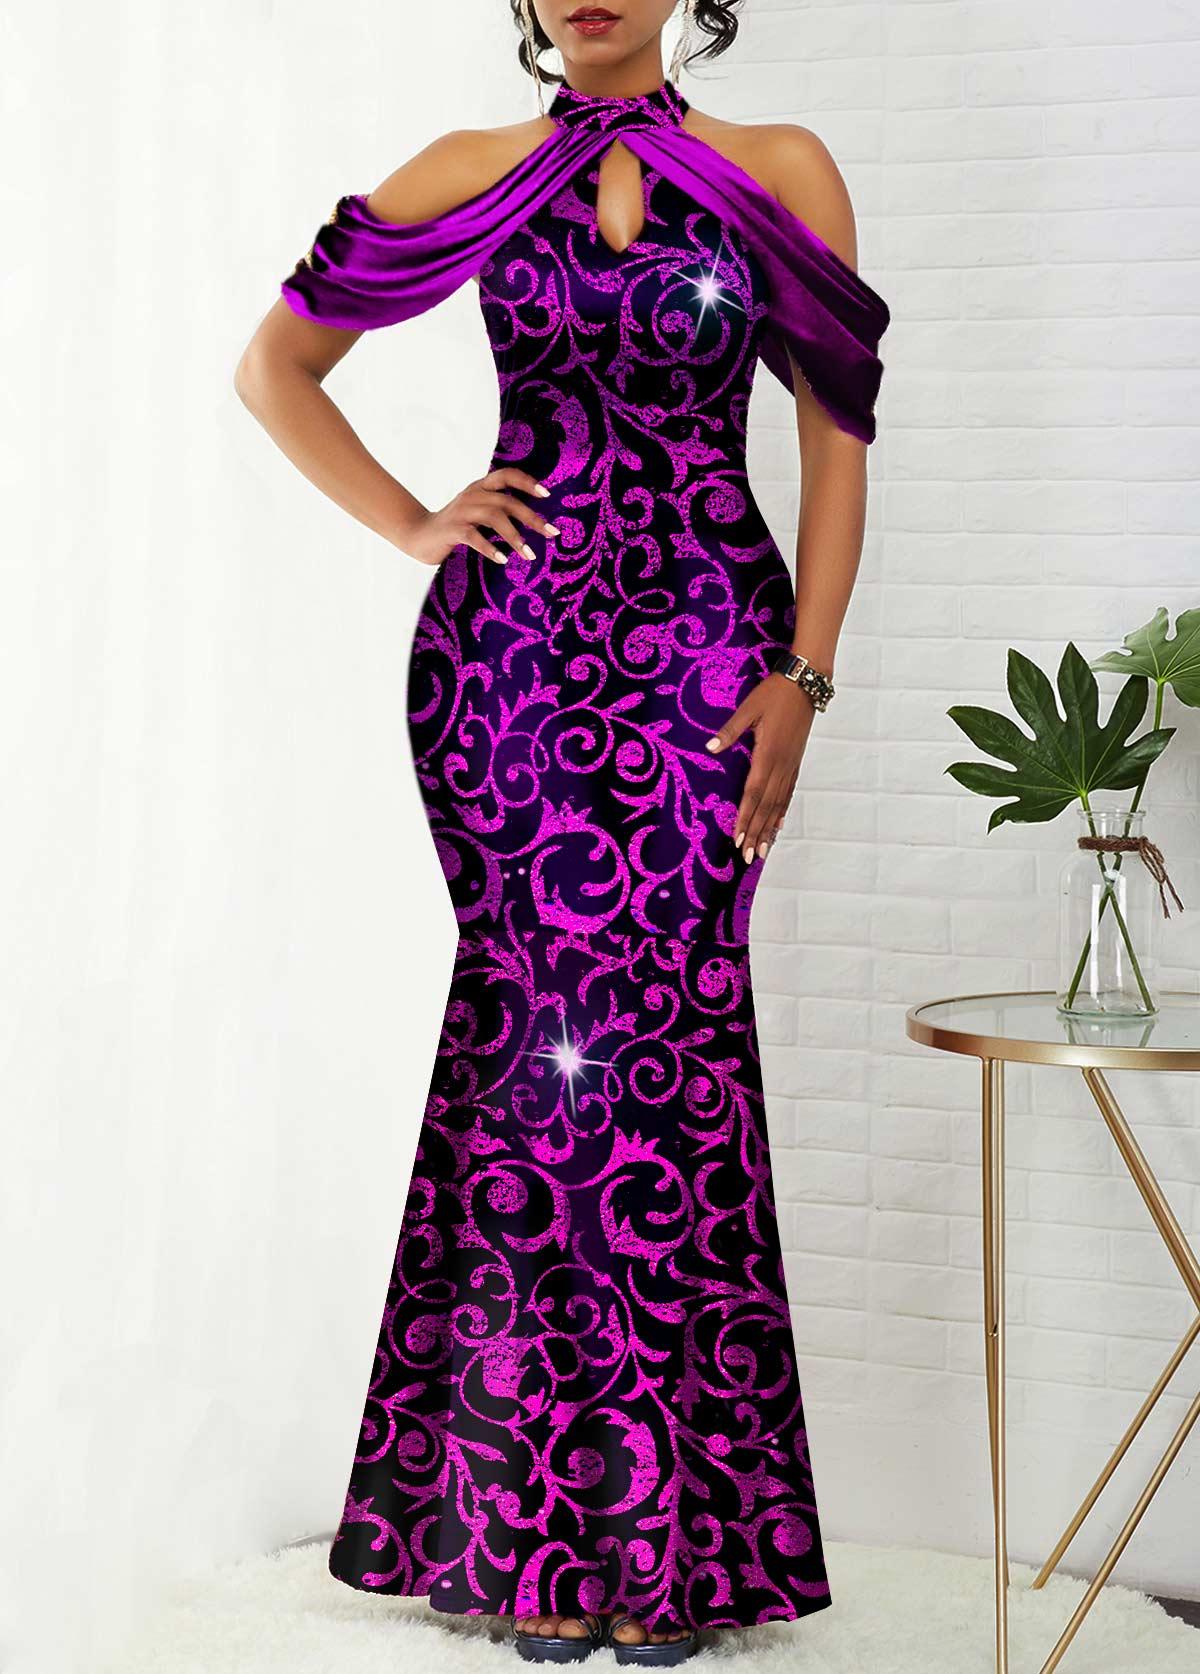 ROTITA Cold Shoulder Bib Neck Shining Mermaid Dress